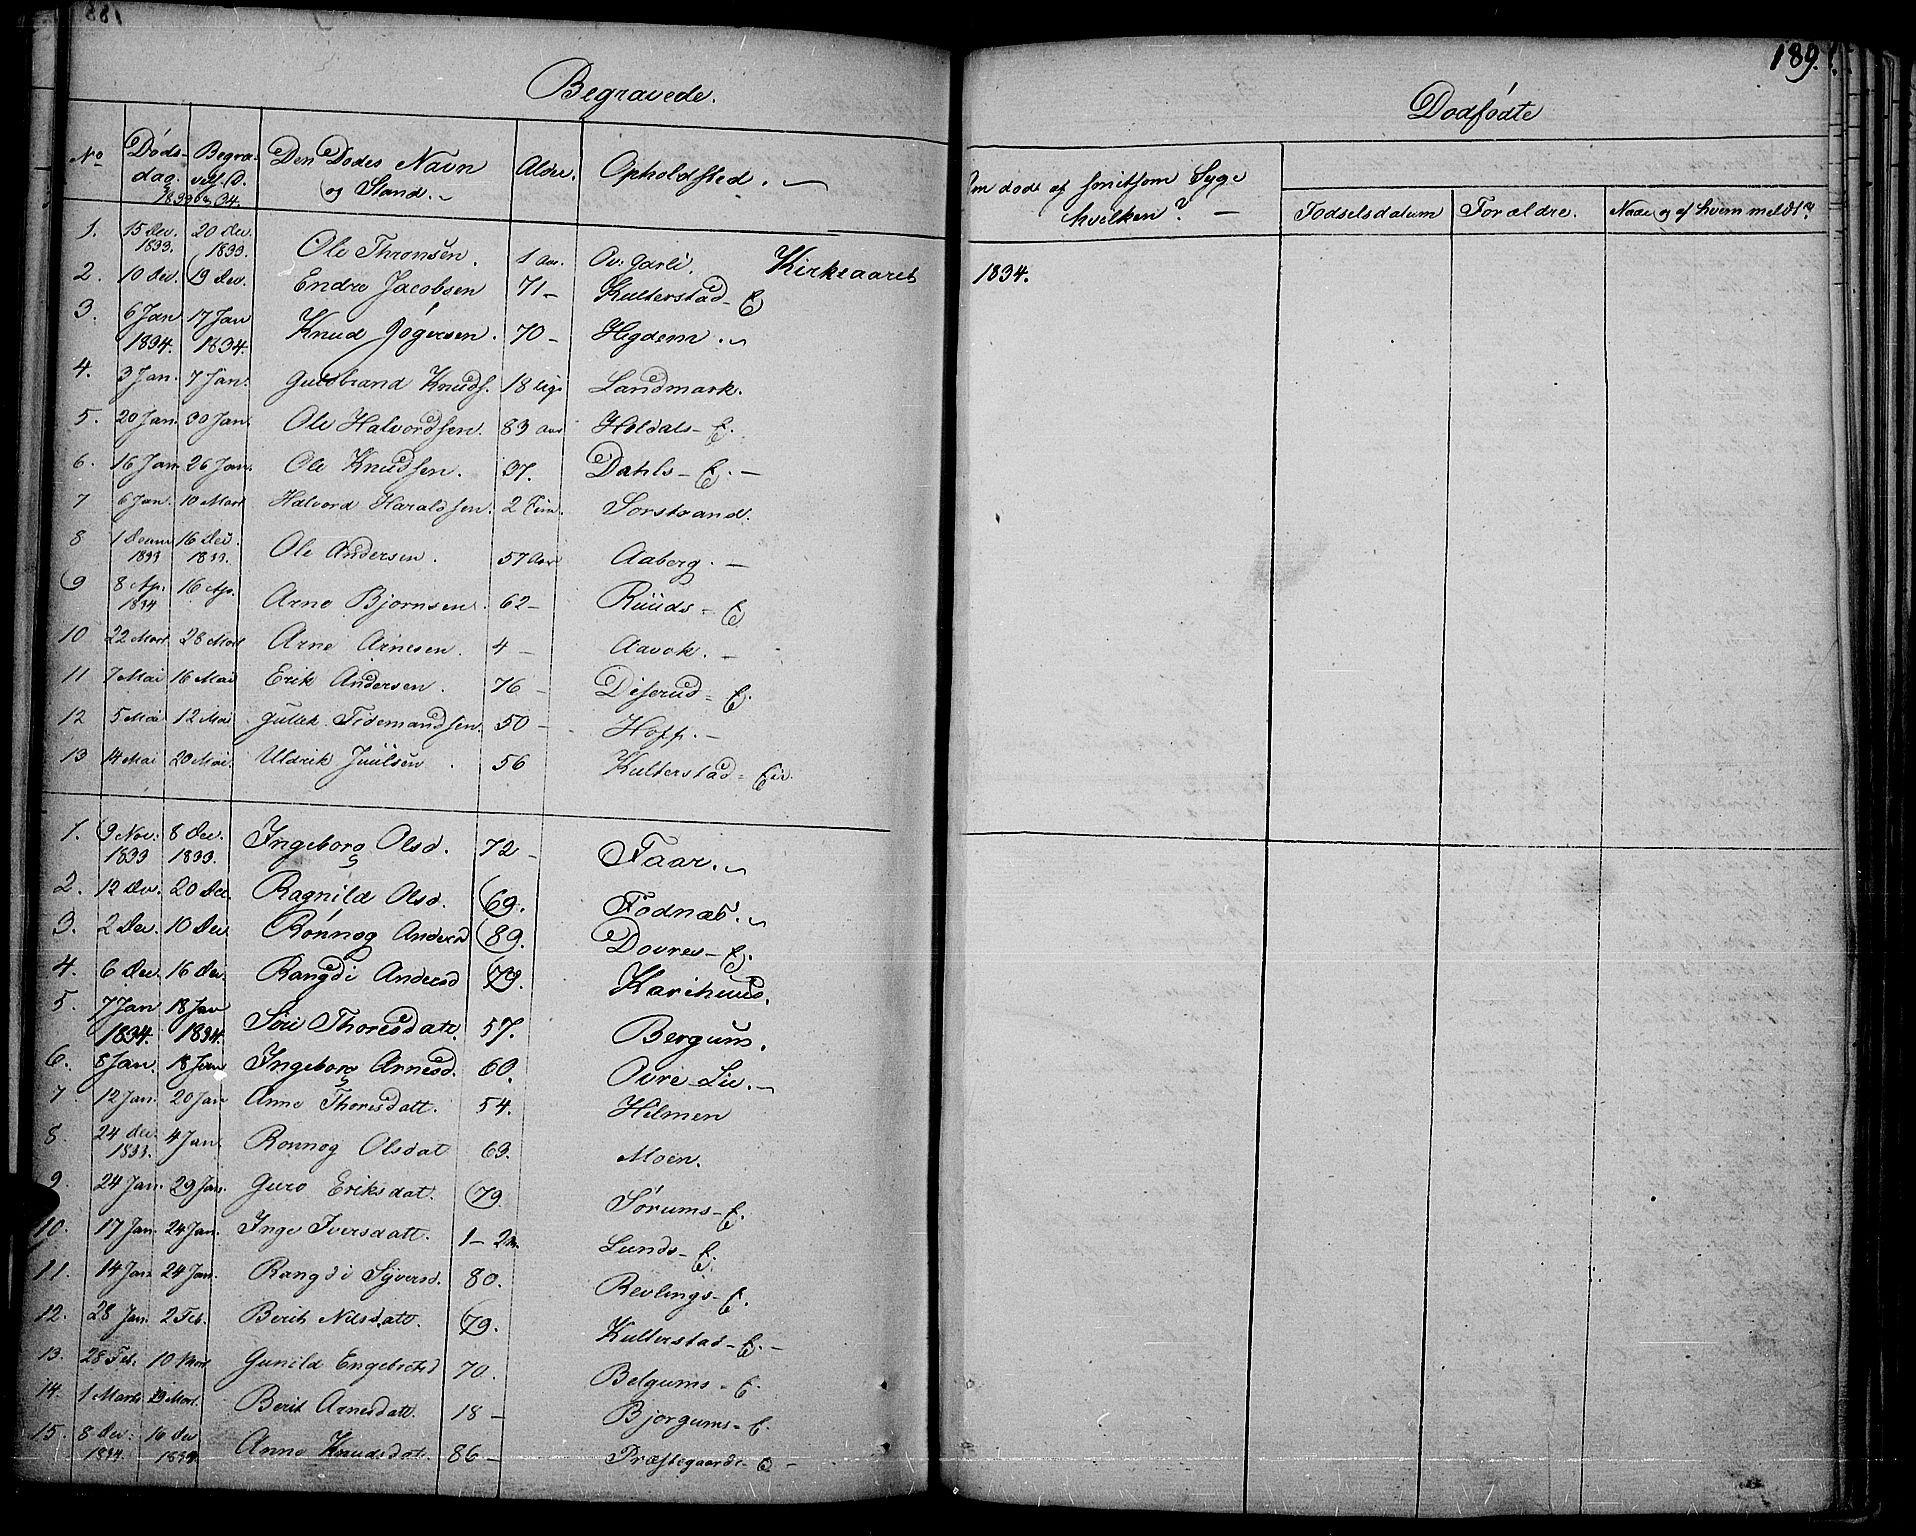 SAH, Nord-Aurdal prestekontor, Ministerialbok nr. 3, 1828-1841, s. 189